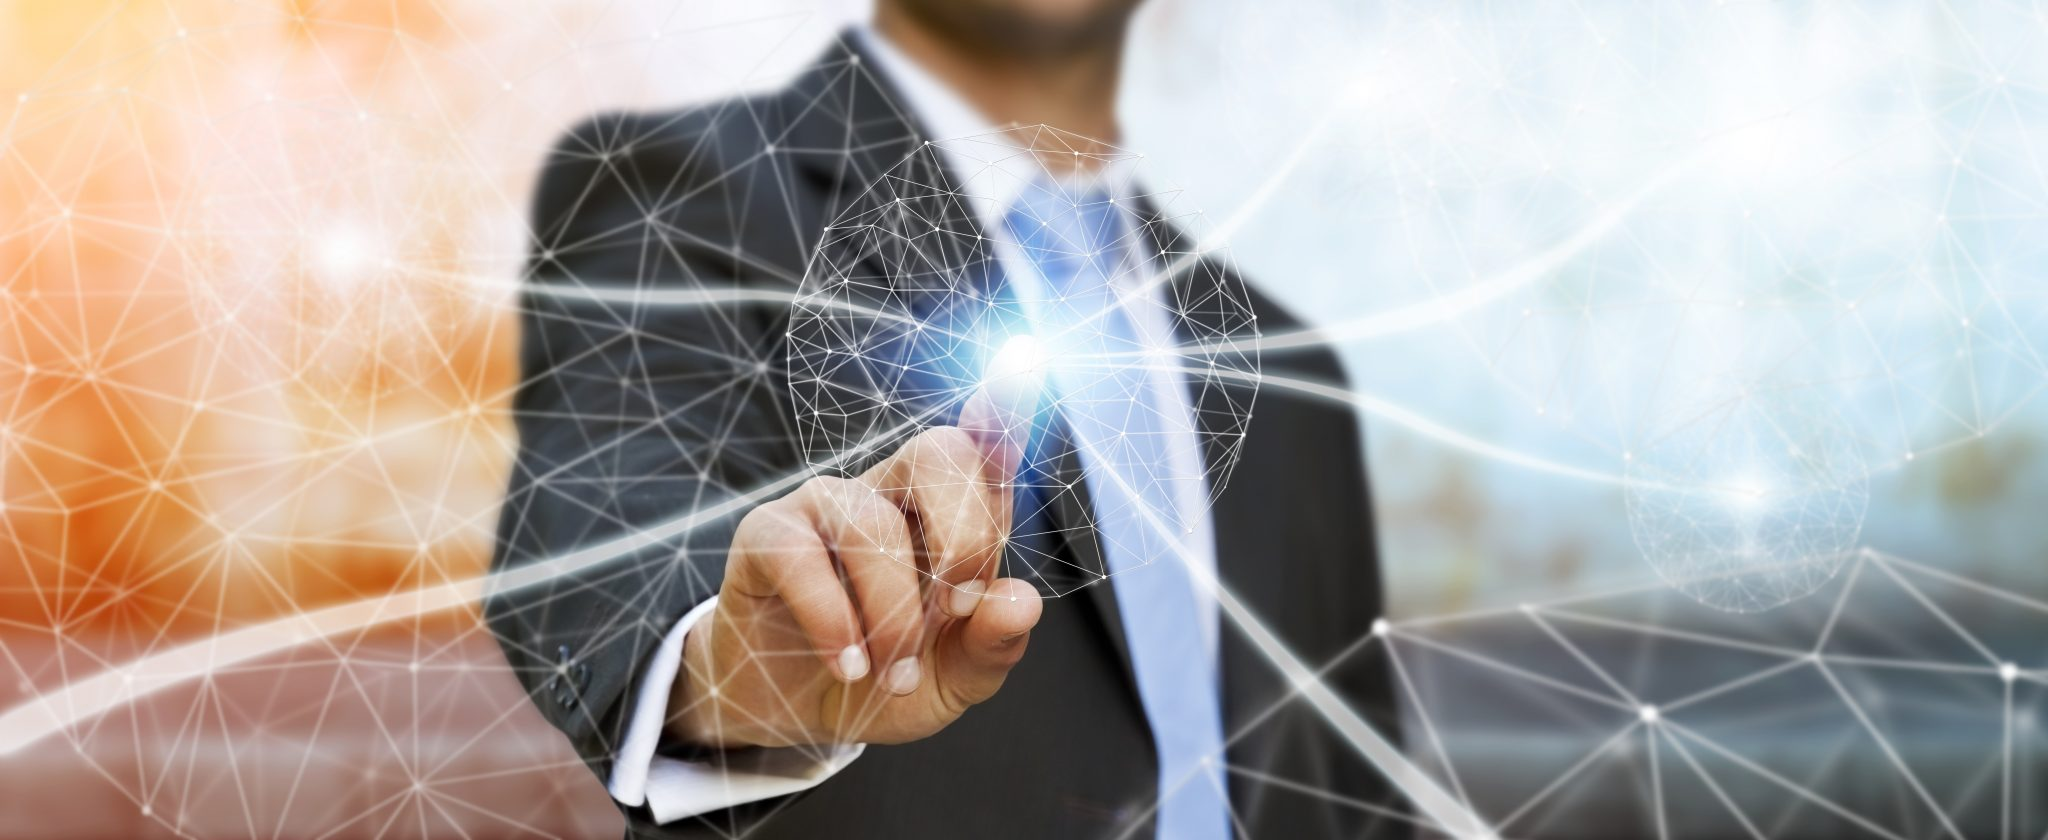 Businessman using data network